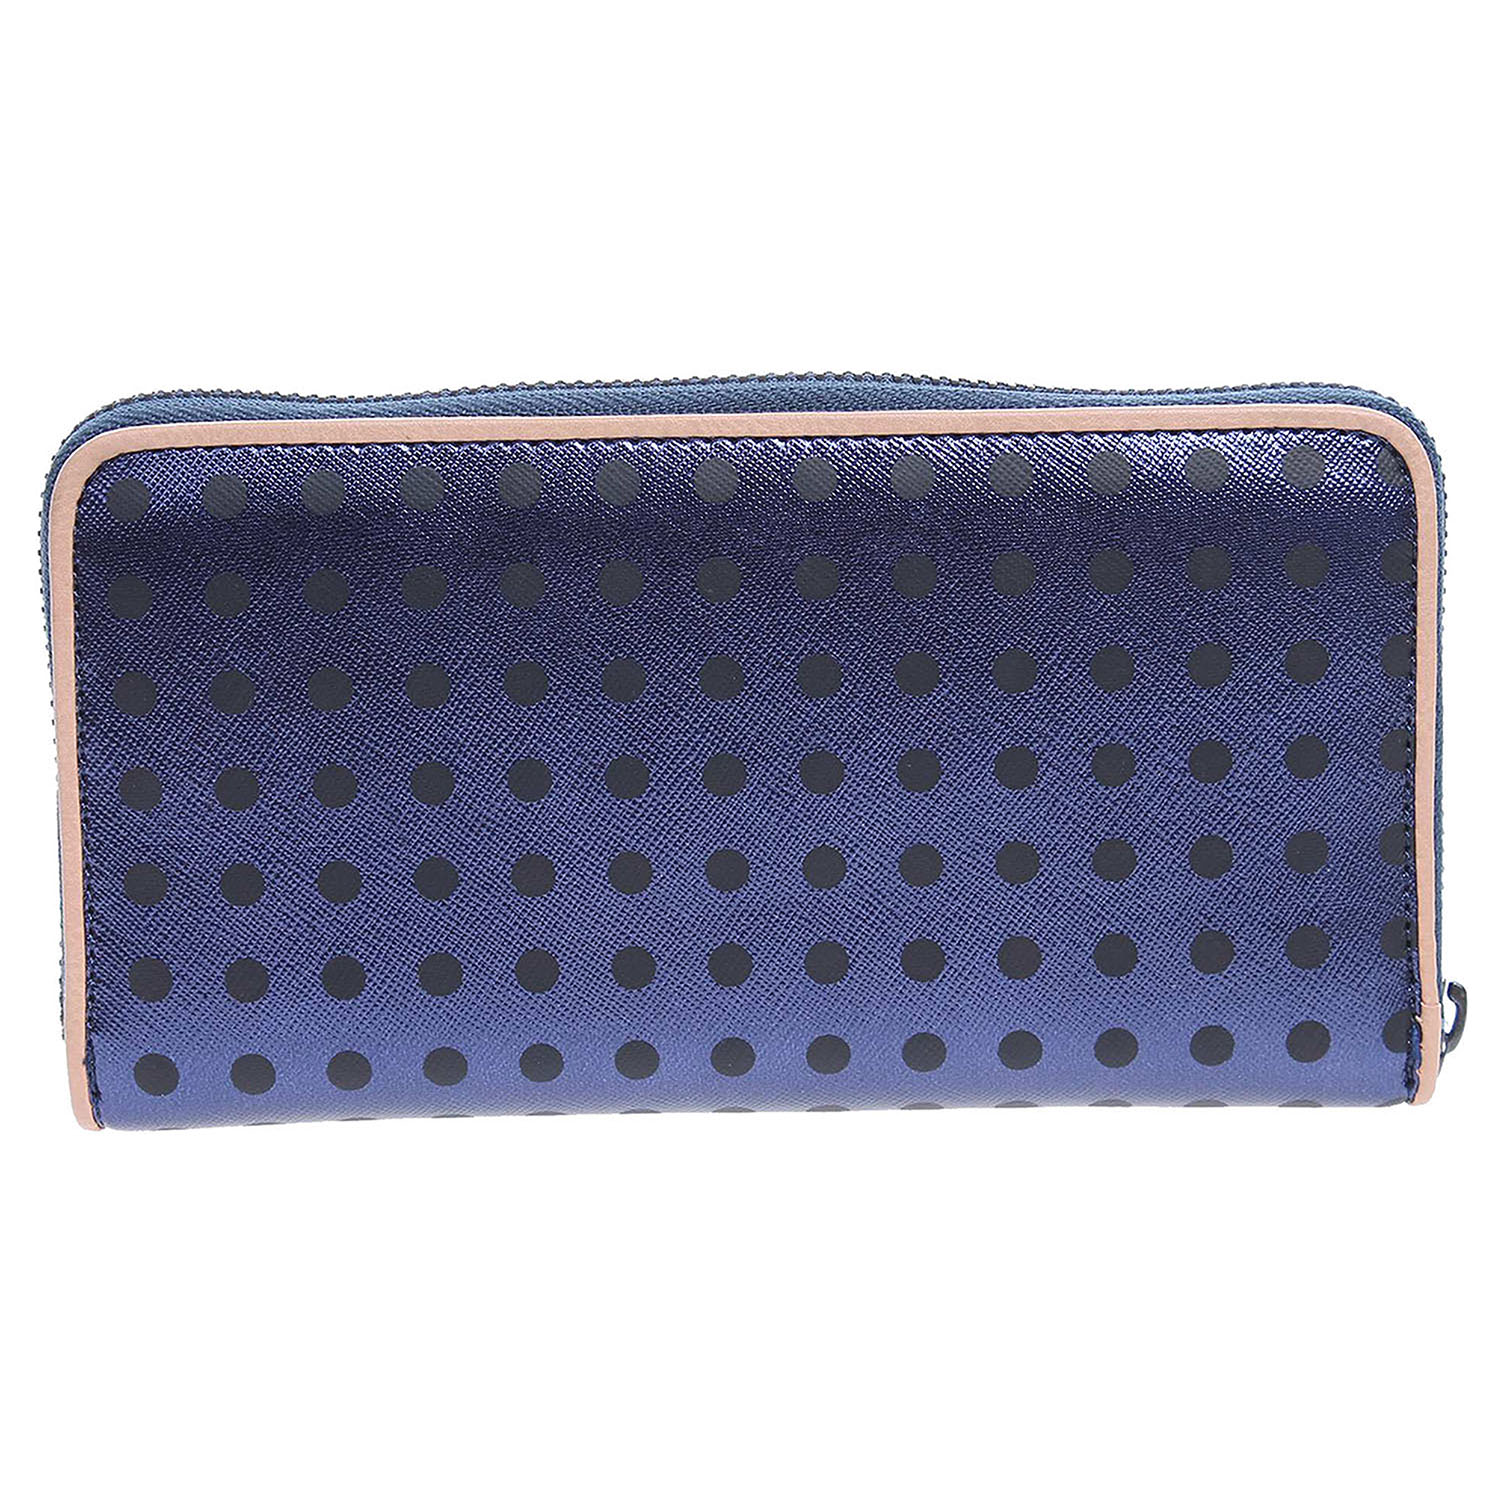 Ecco Hello Kitty 19229.6 azul dámská peněženka modrá 14200418